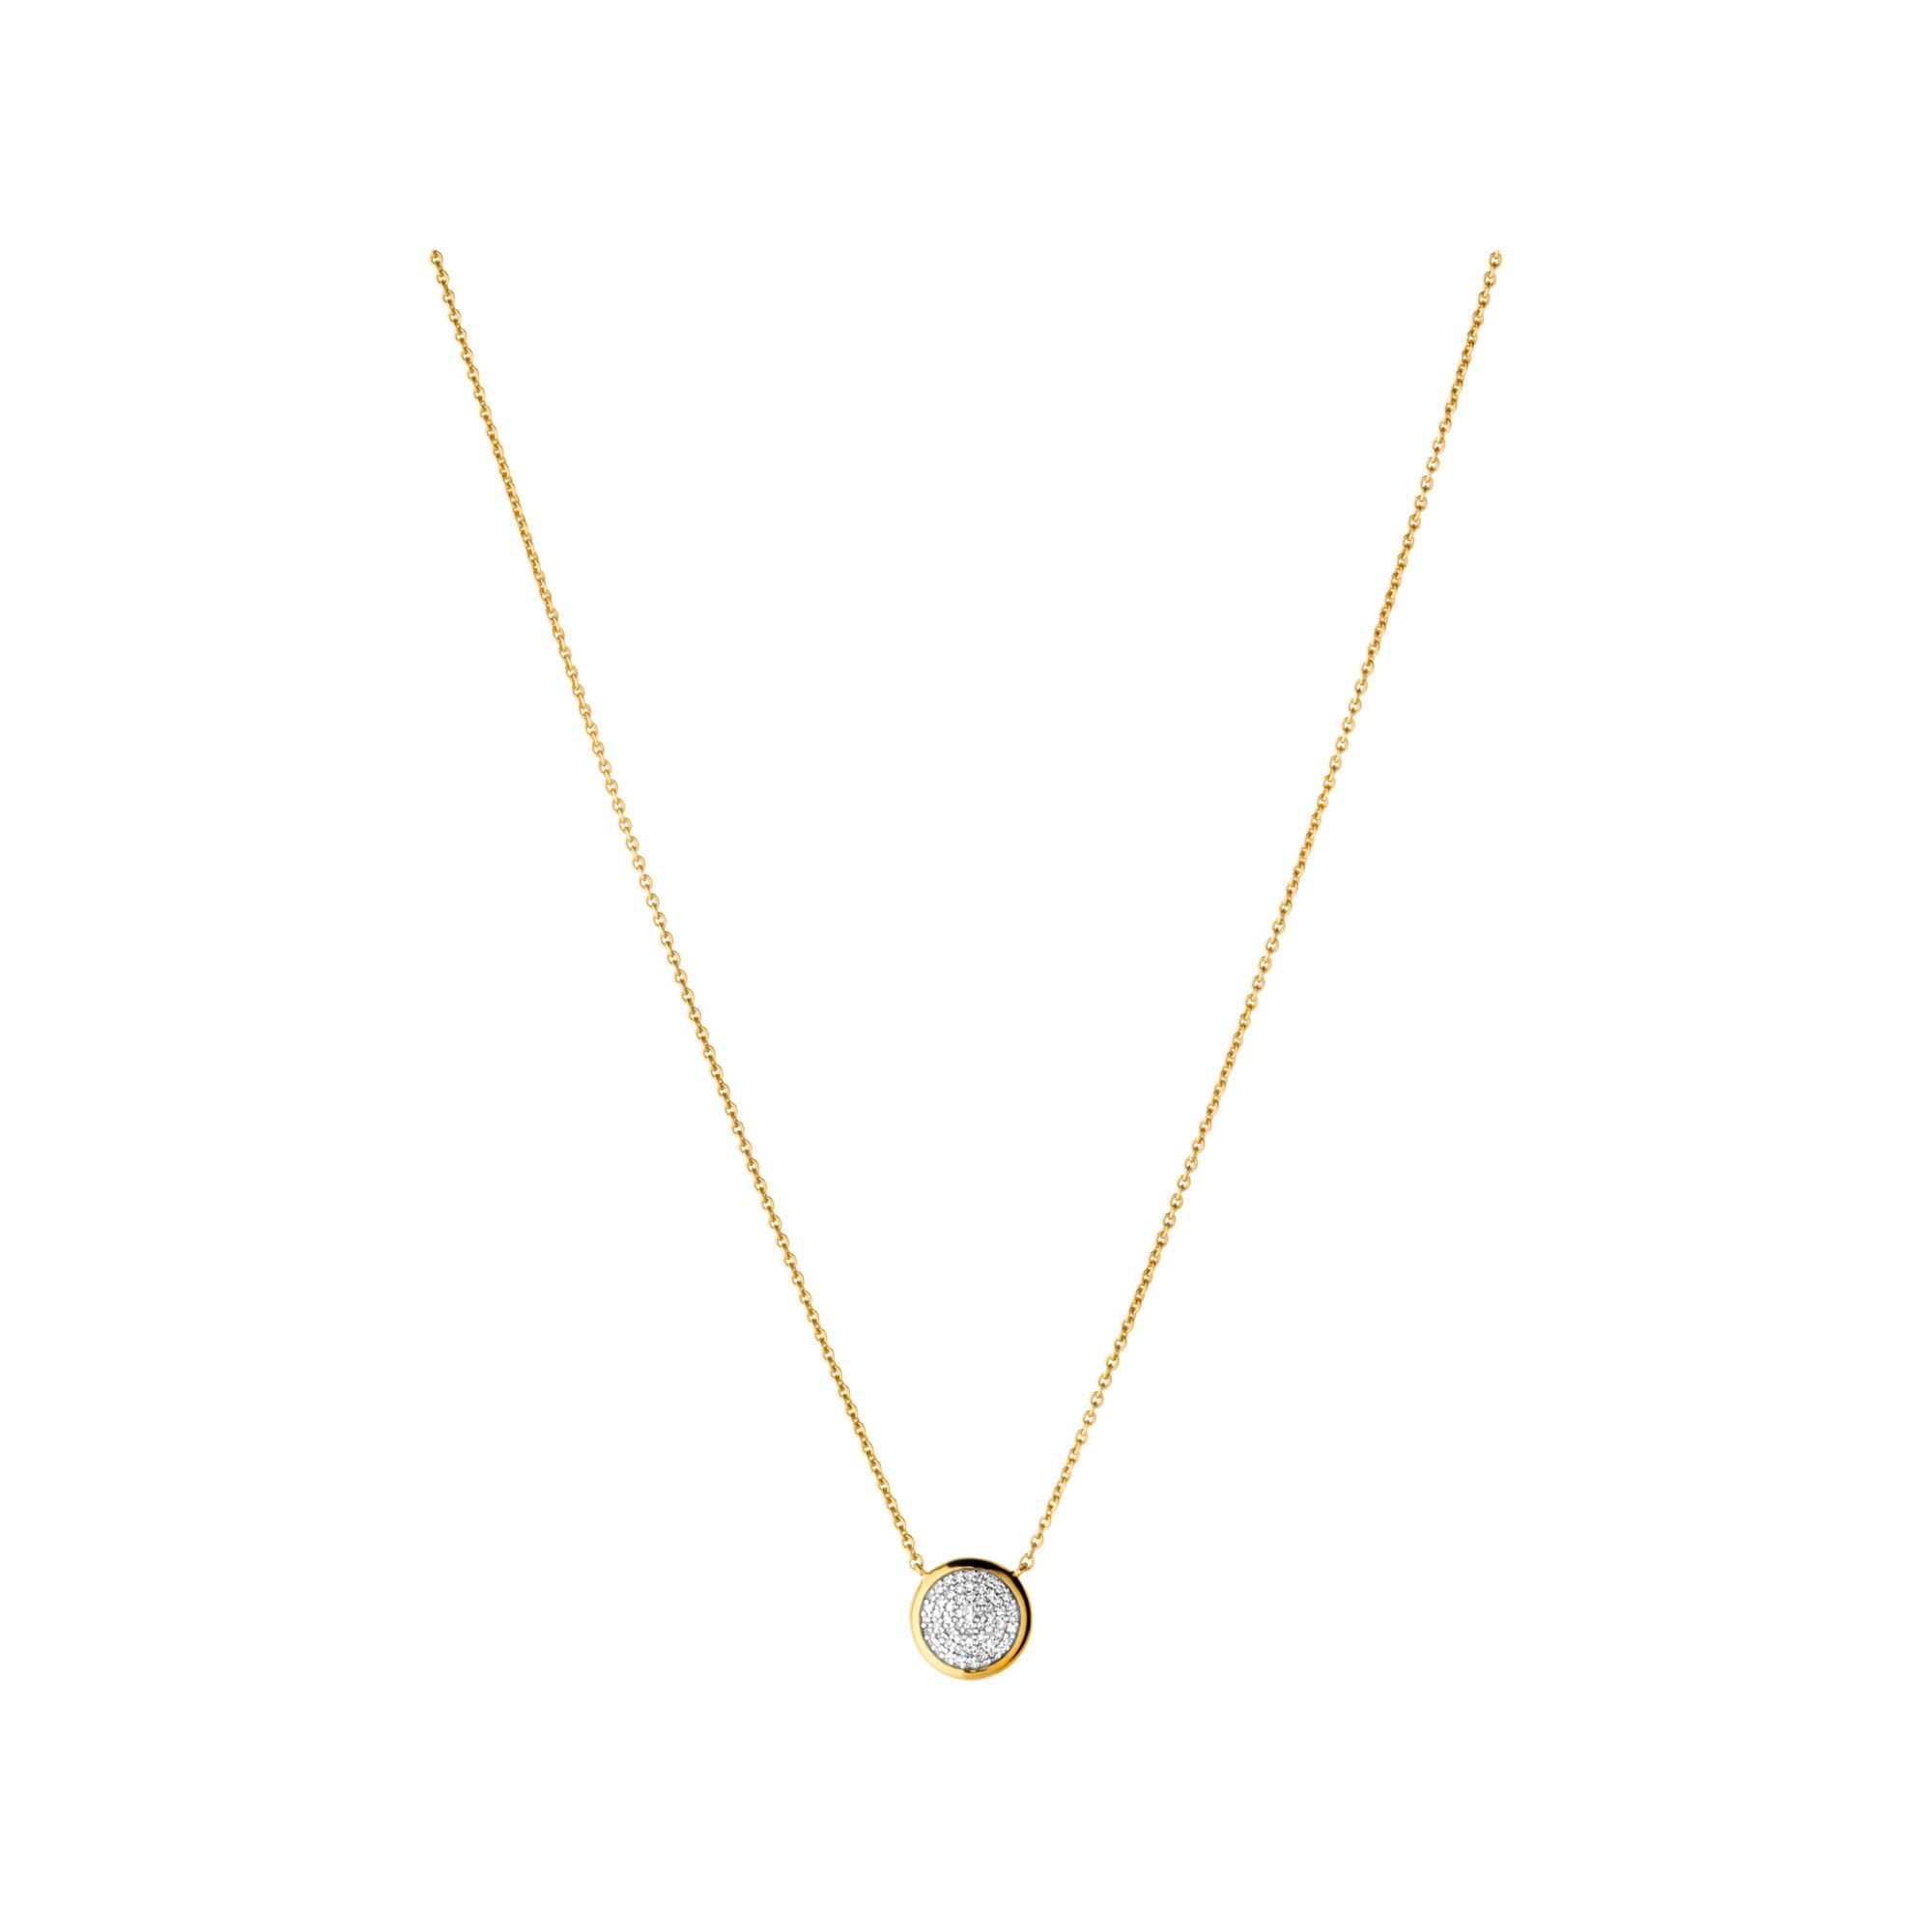 Diamond essentials yellow gold pave round necklace links of london diamond essentials pave round necklace yellow gold vermeil hires aloadofball Choice Image